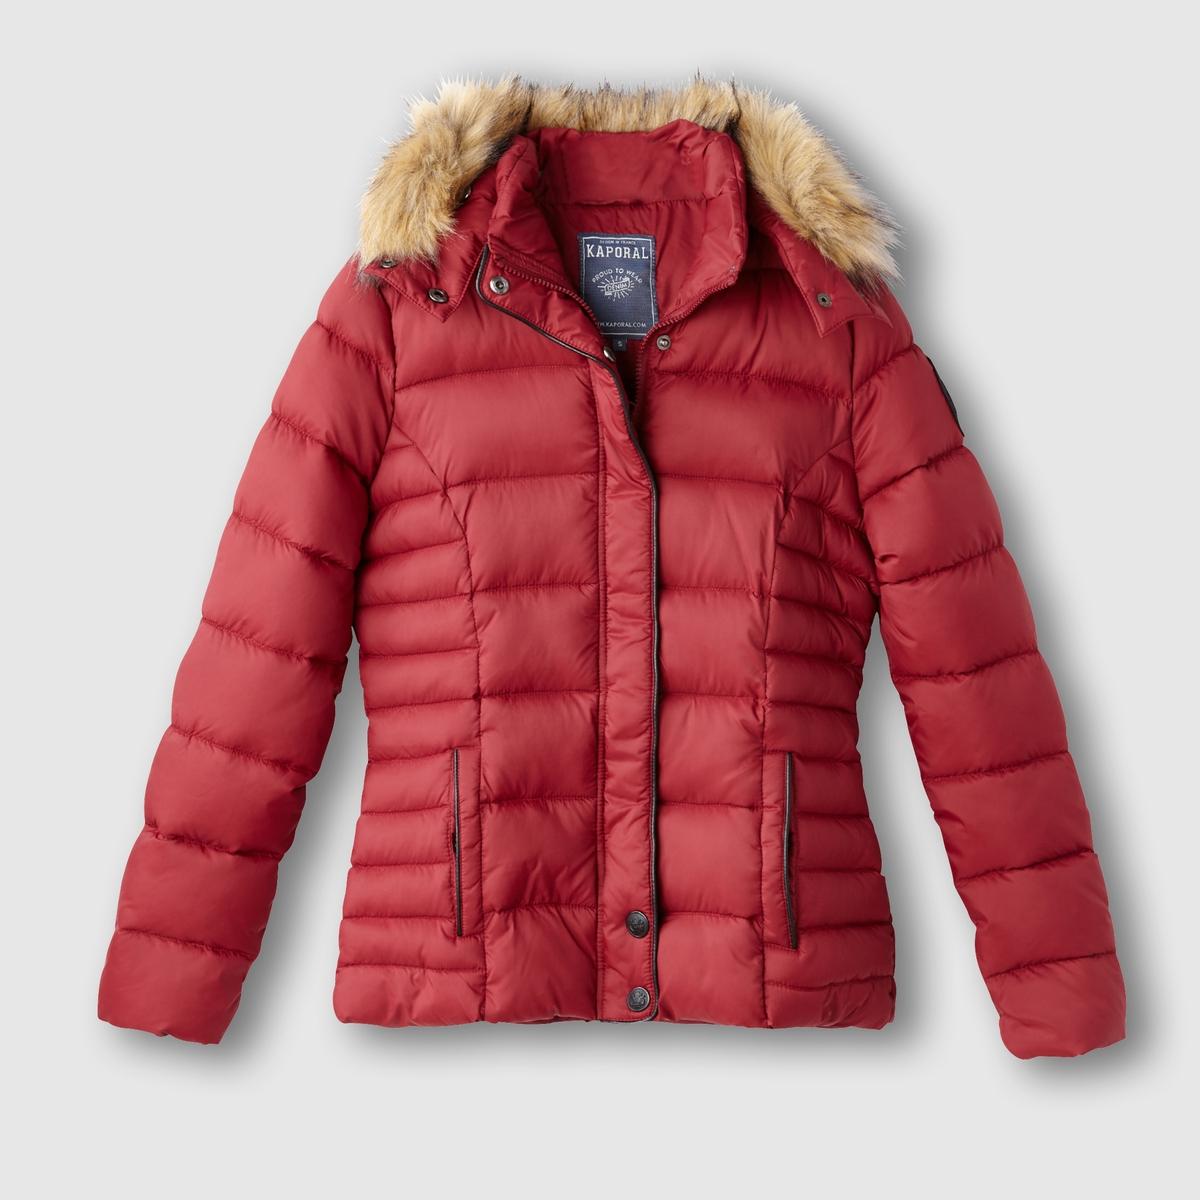 Куртка стёганая с капюшоном MINKO